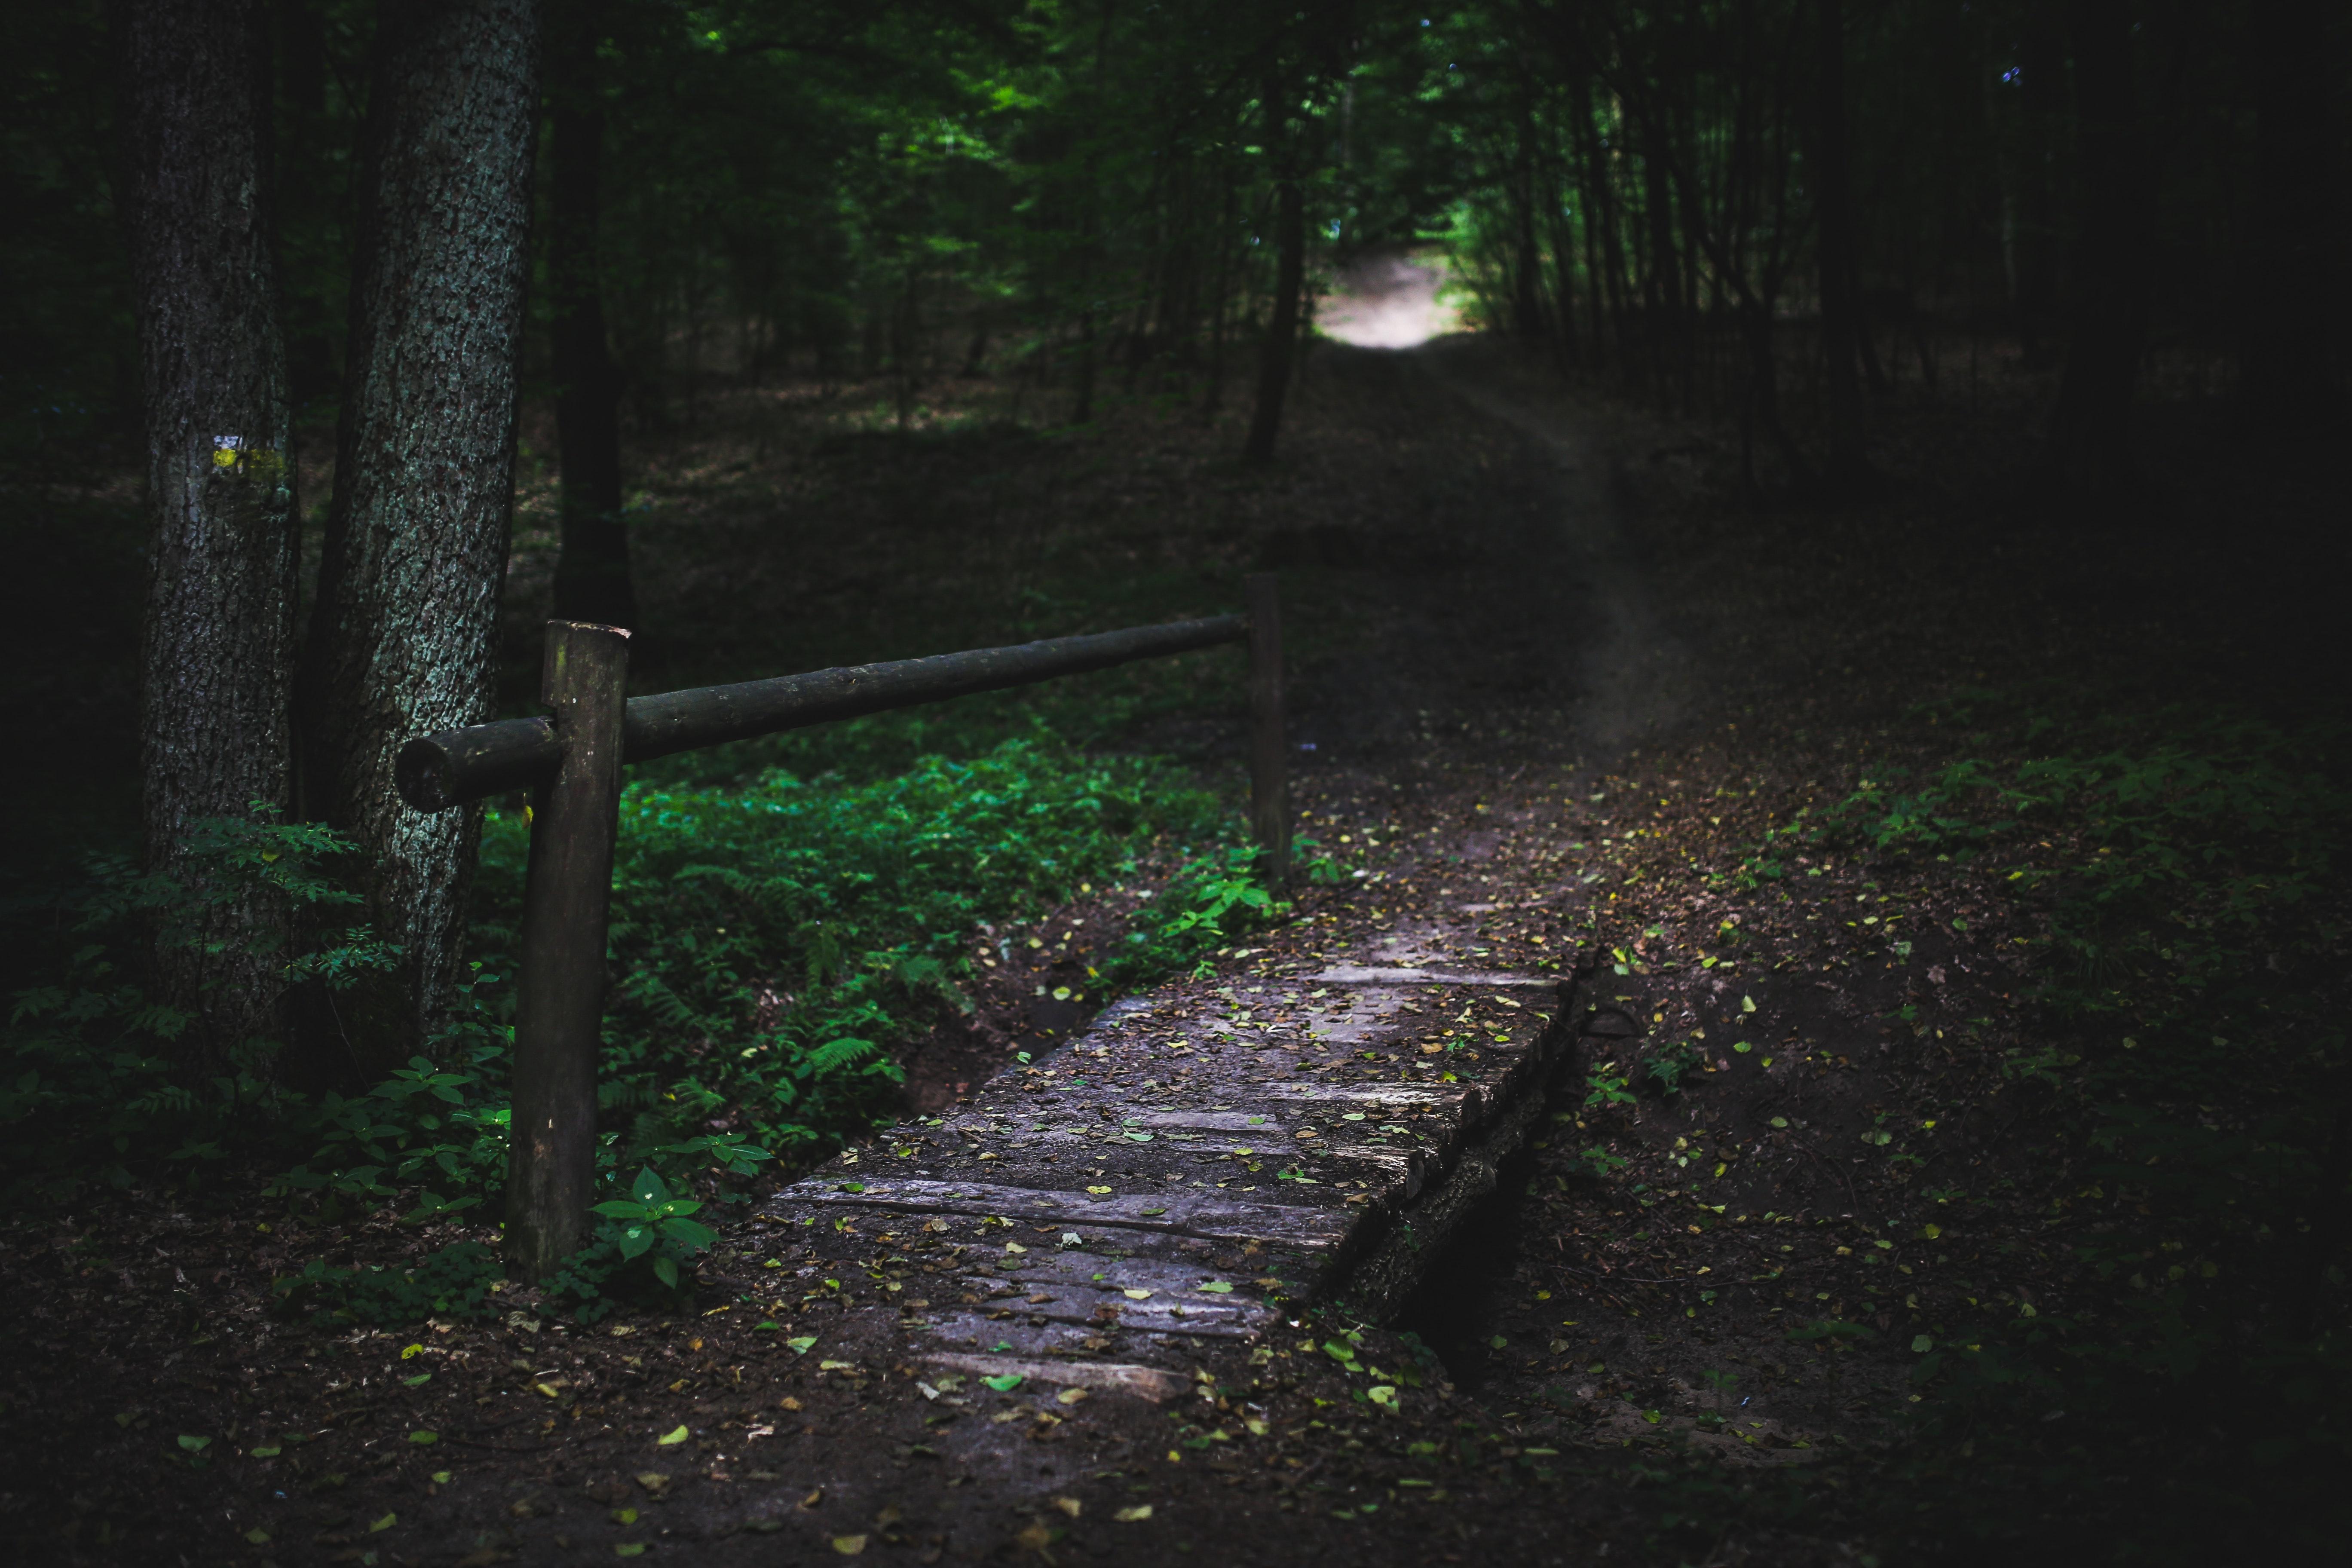 Bridge in the forest II, Dark, Footbridge, Forest, Mystical, HQ Photo